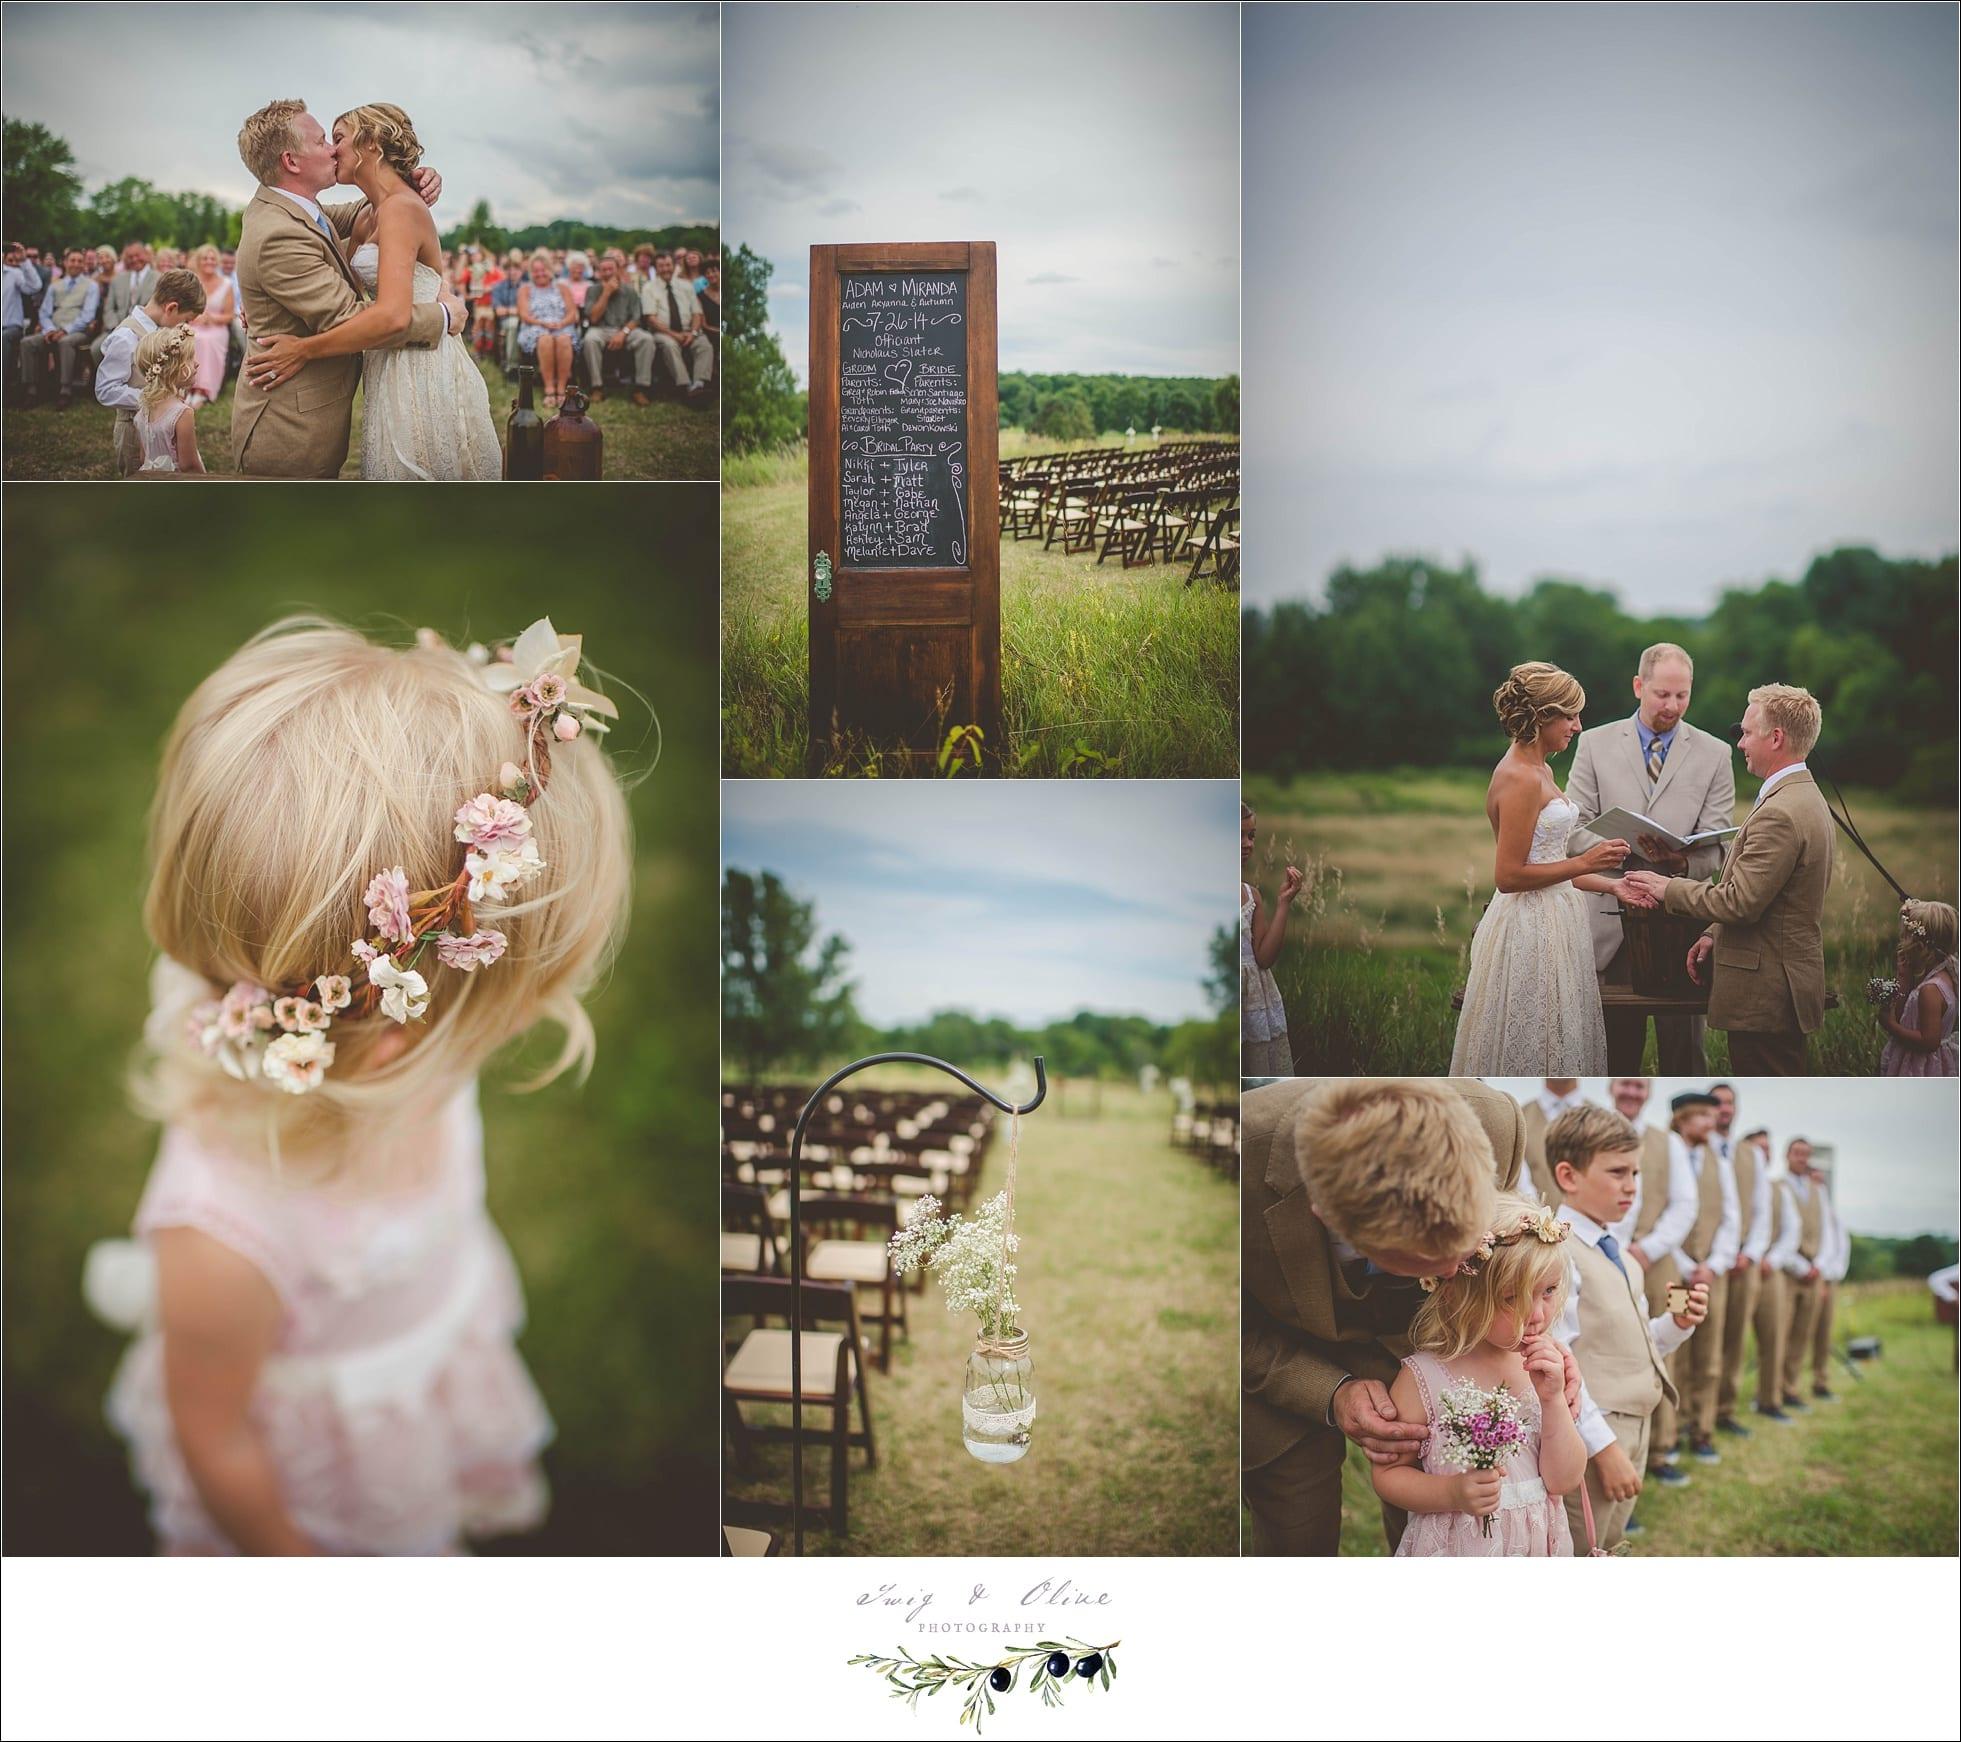 Outdoor Wedding Wisconsin: Twig & Olive PhotographyMiranda & Adam